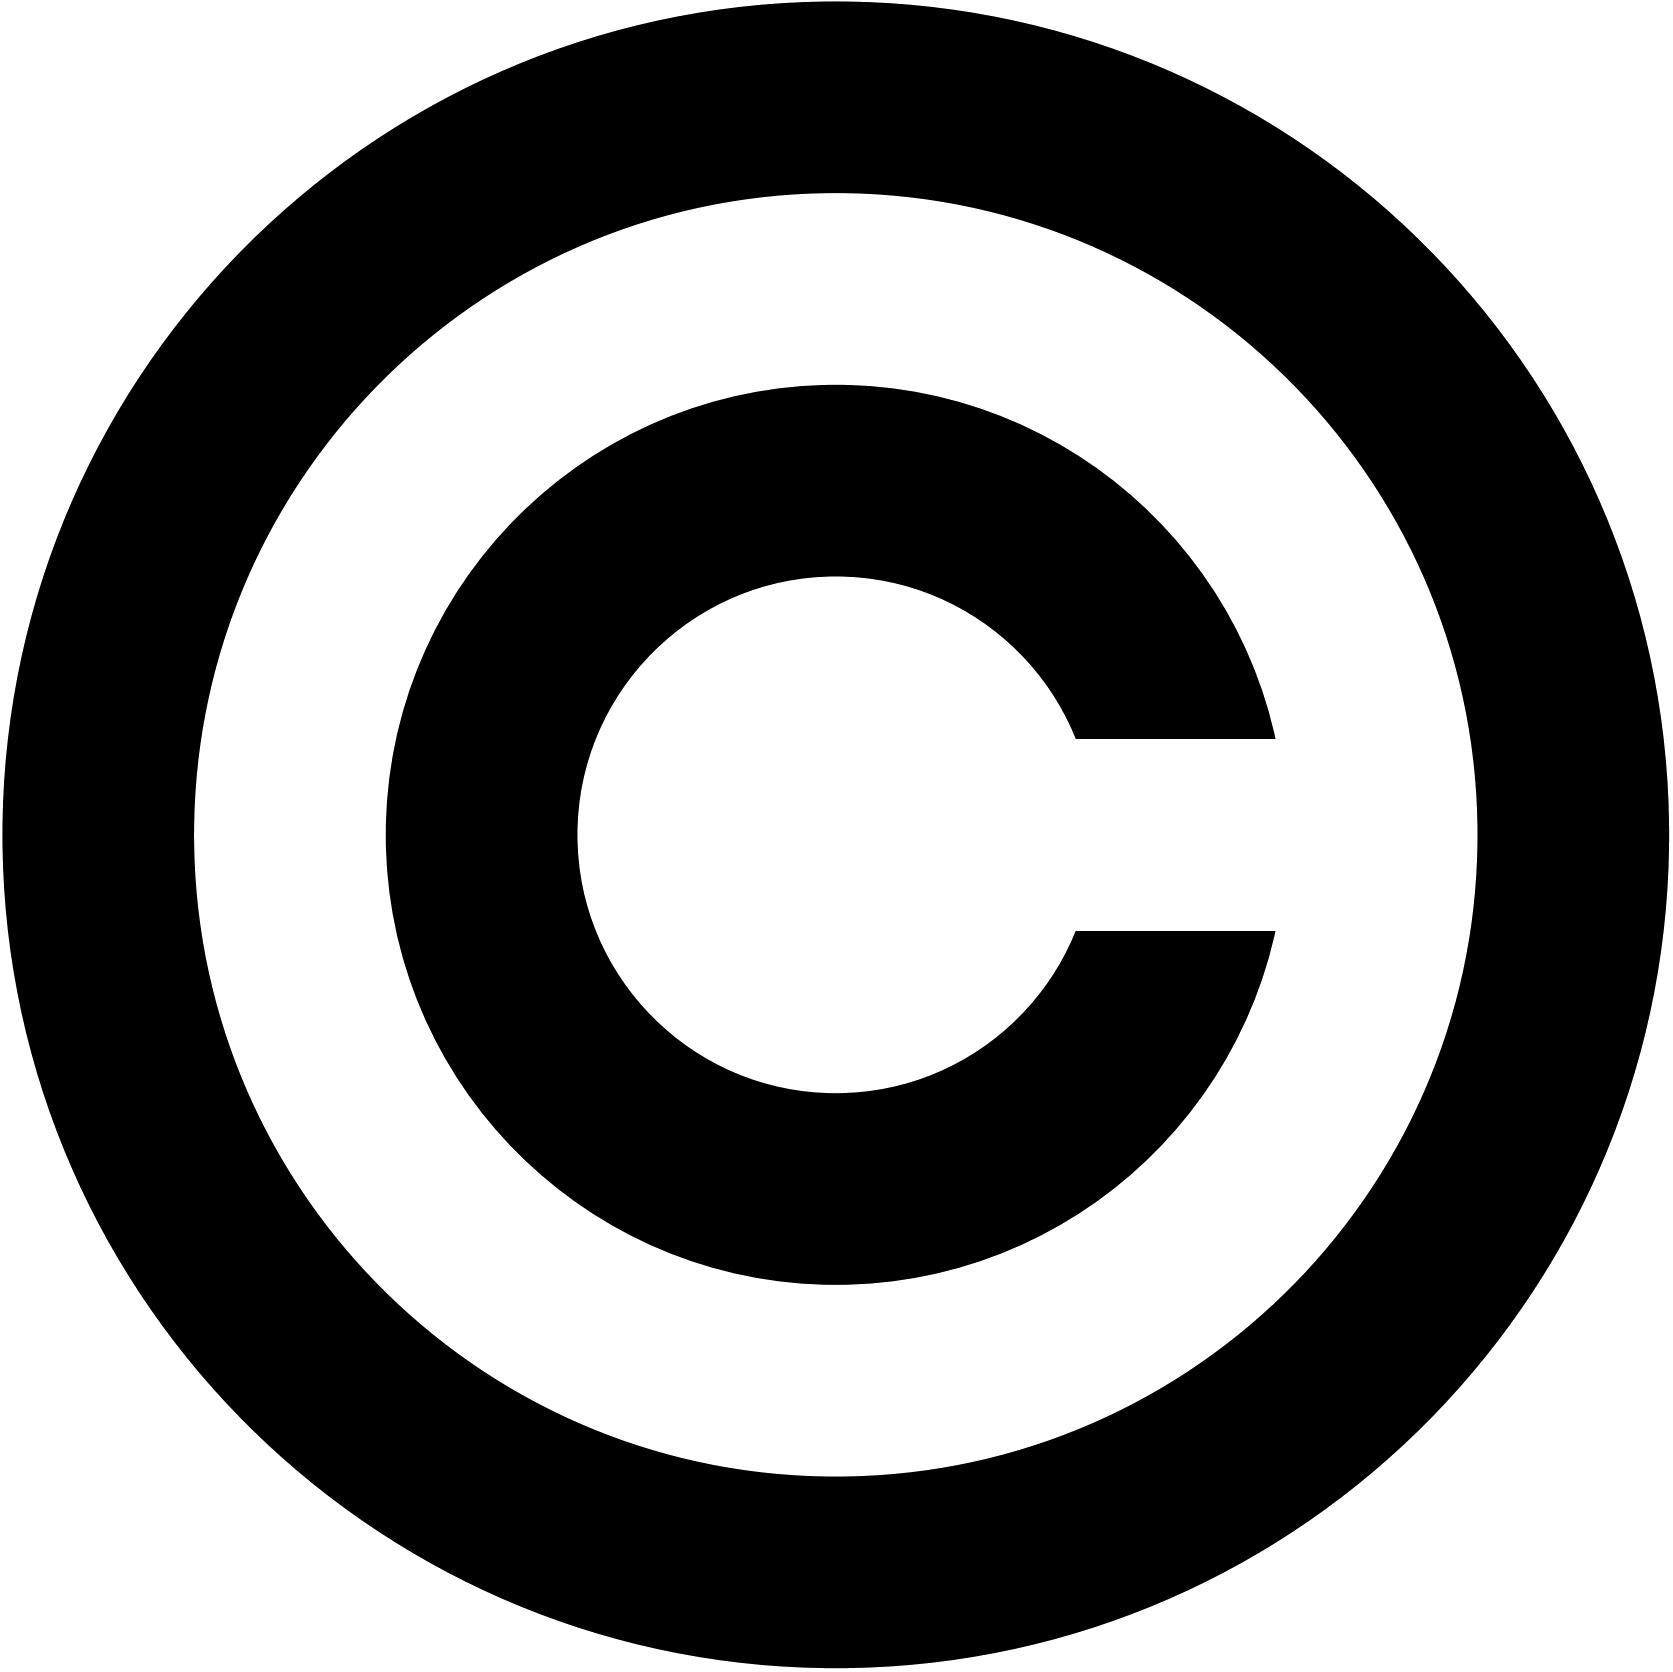 Copyright Symbol Clipart.